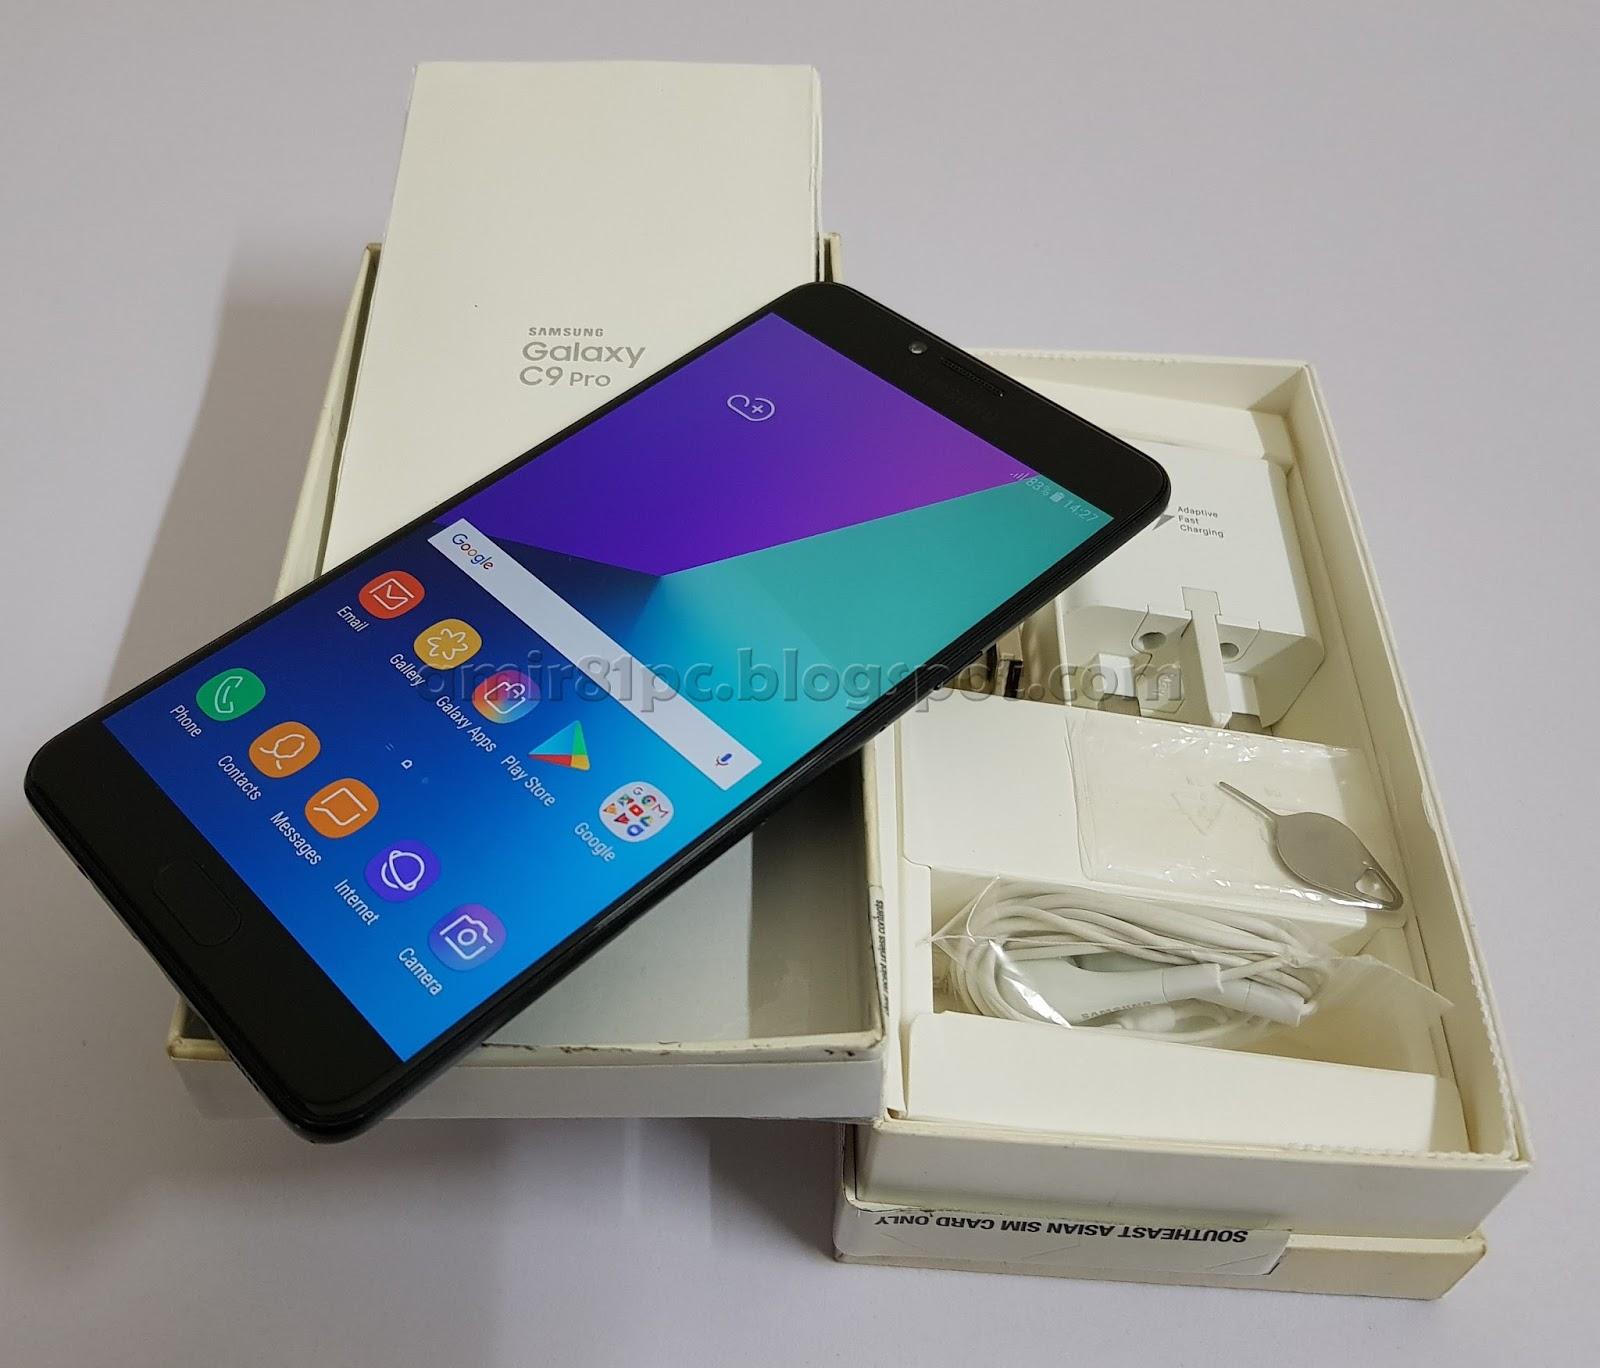 Used Original Malaysia Set Samsung Galaxy C9 Pro 6GB RAM 64GB ROM 16MP Camera Front Back Display 6 Inch Full HD Fingerprint Sensor RM 1285